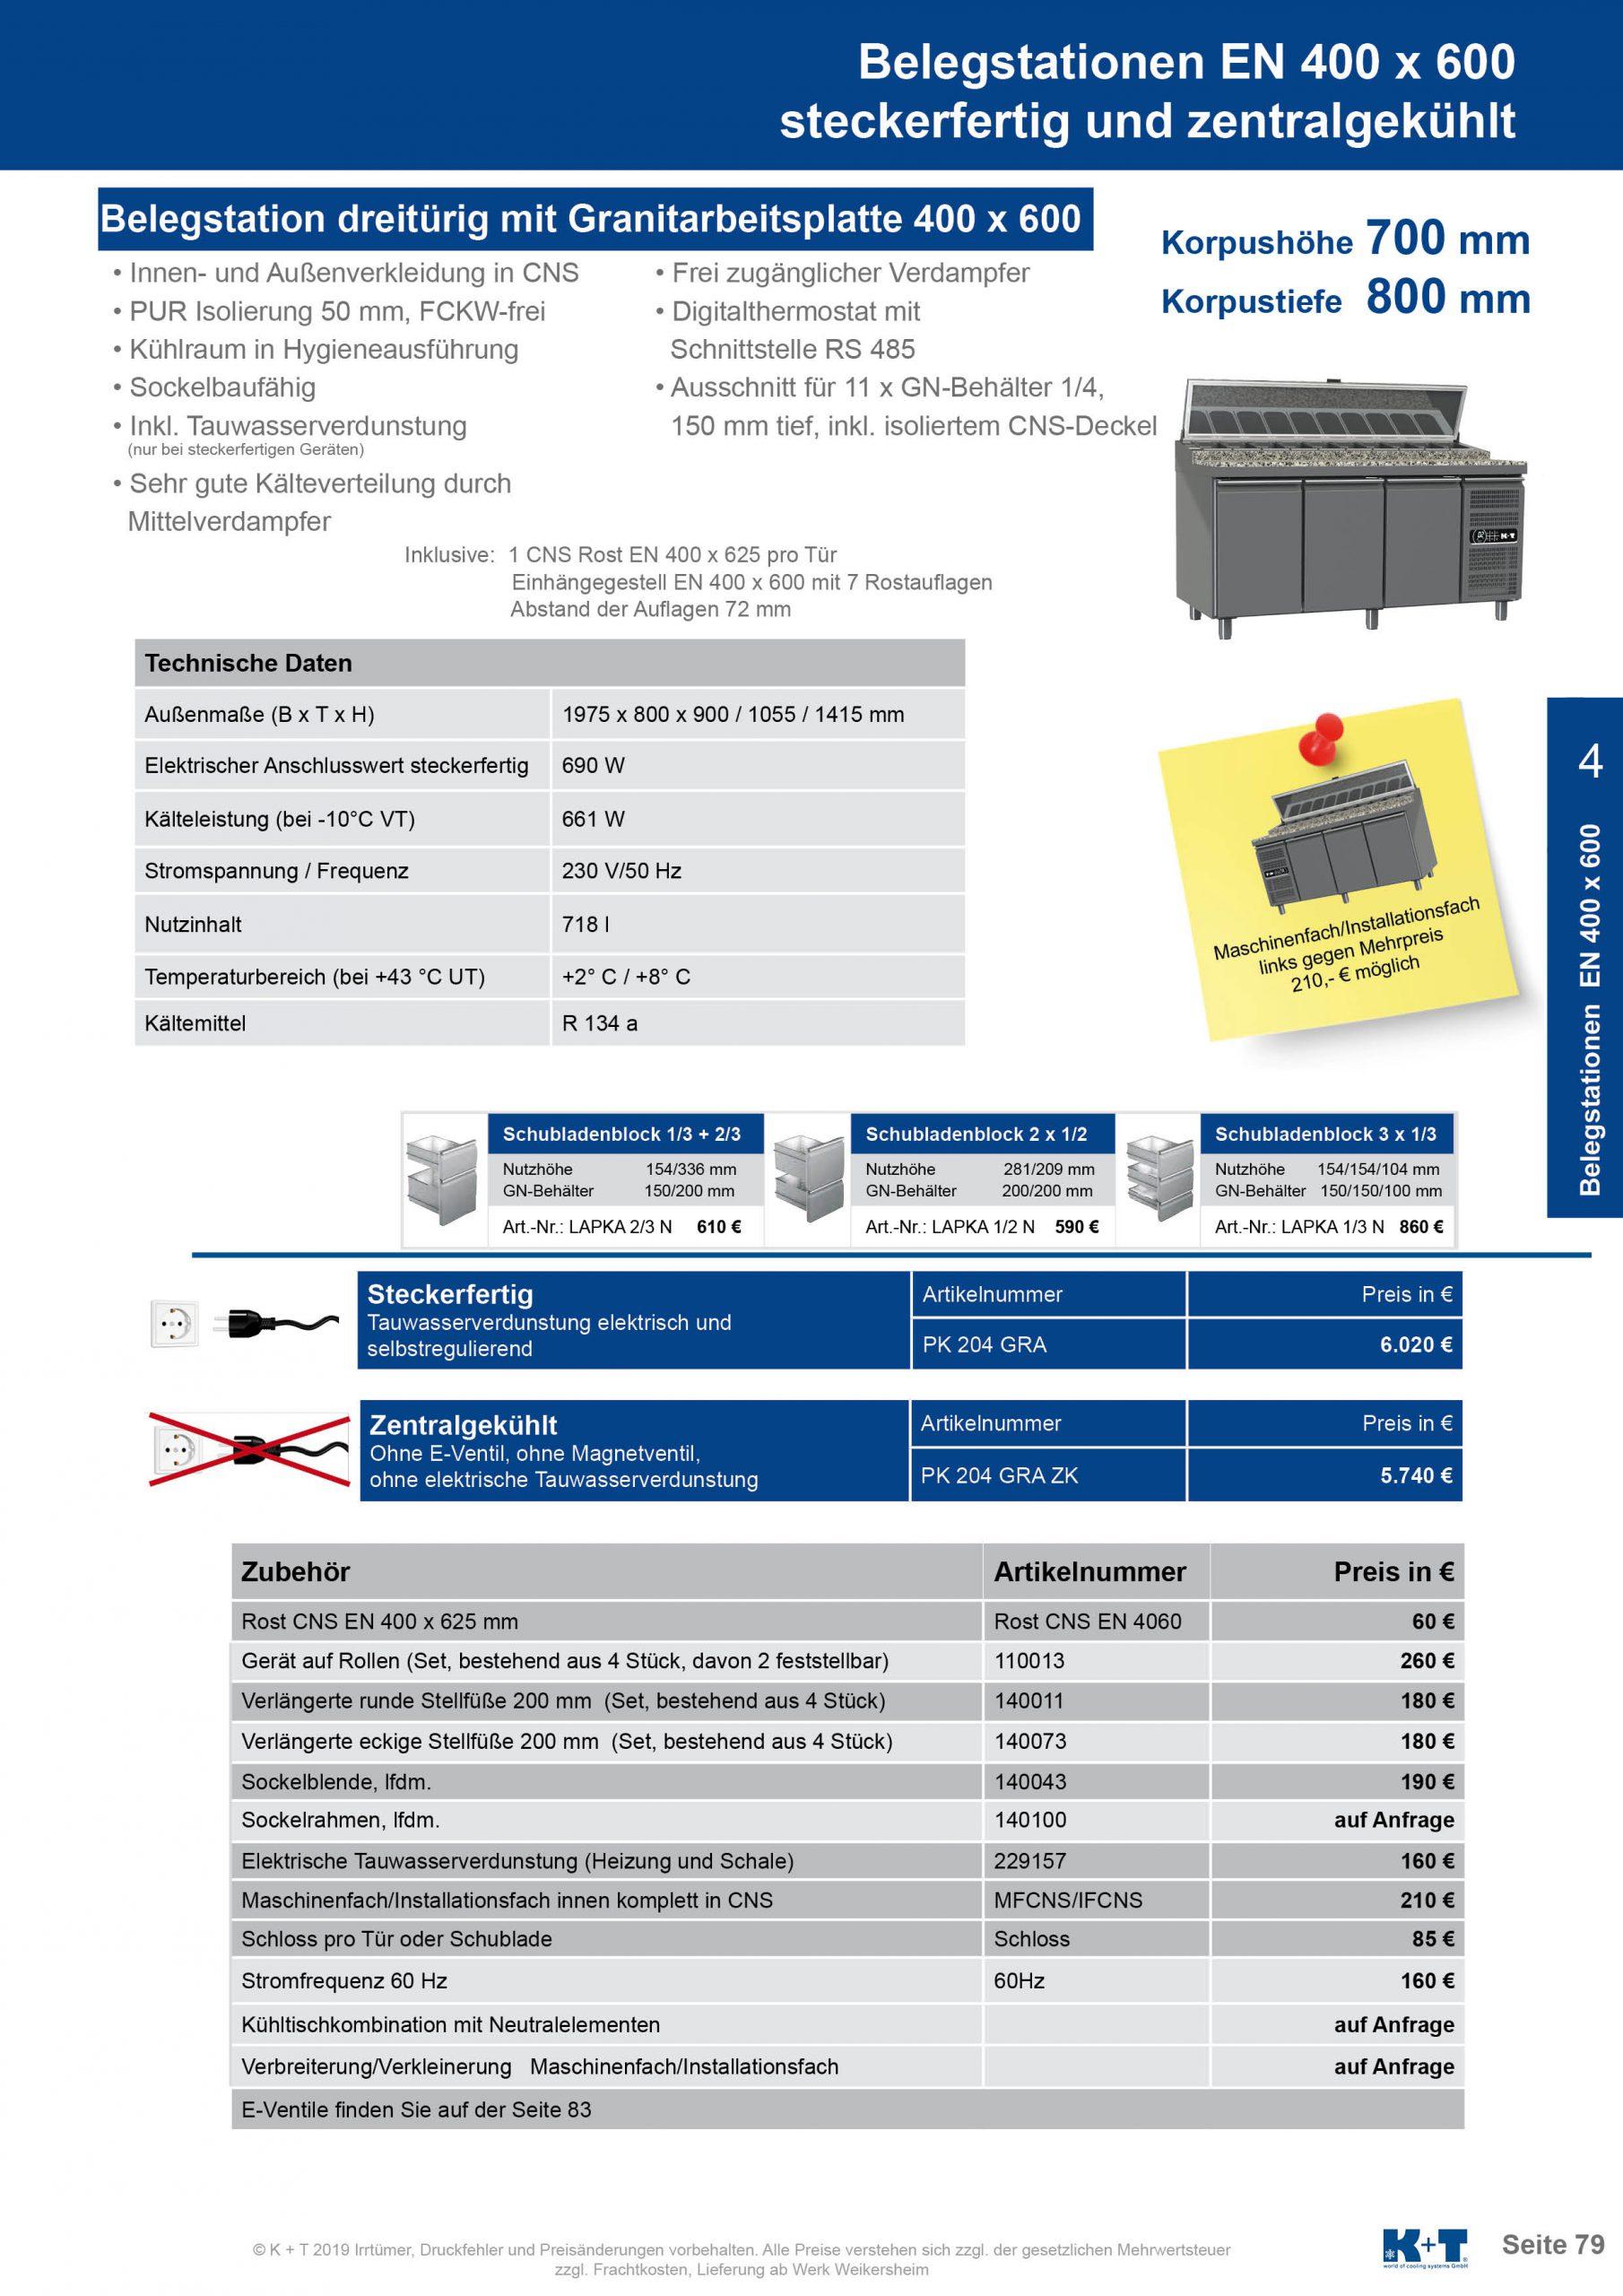 Belegstation Euronorm 400 x 600 Korpushöhe 700, Tiefe 800 steckerfertig 4